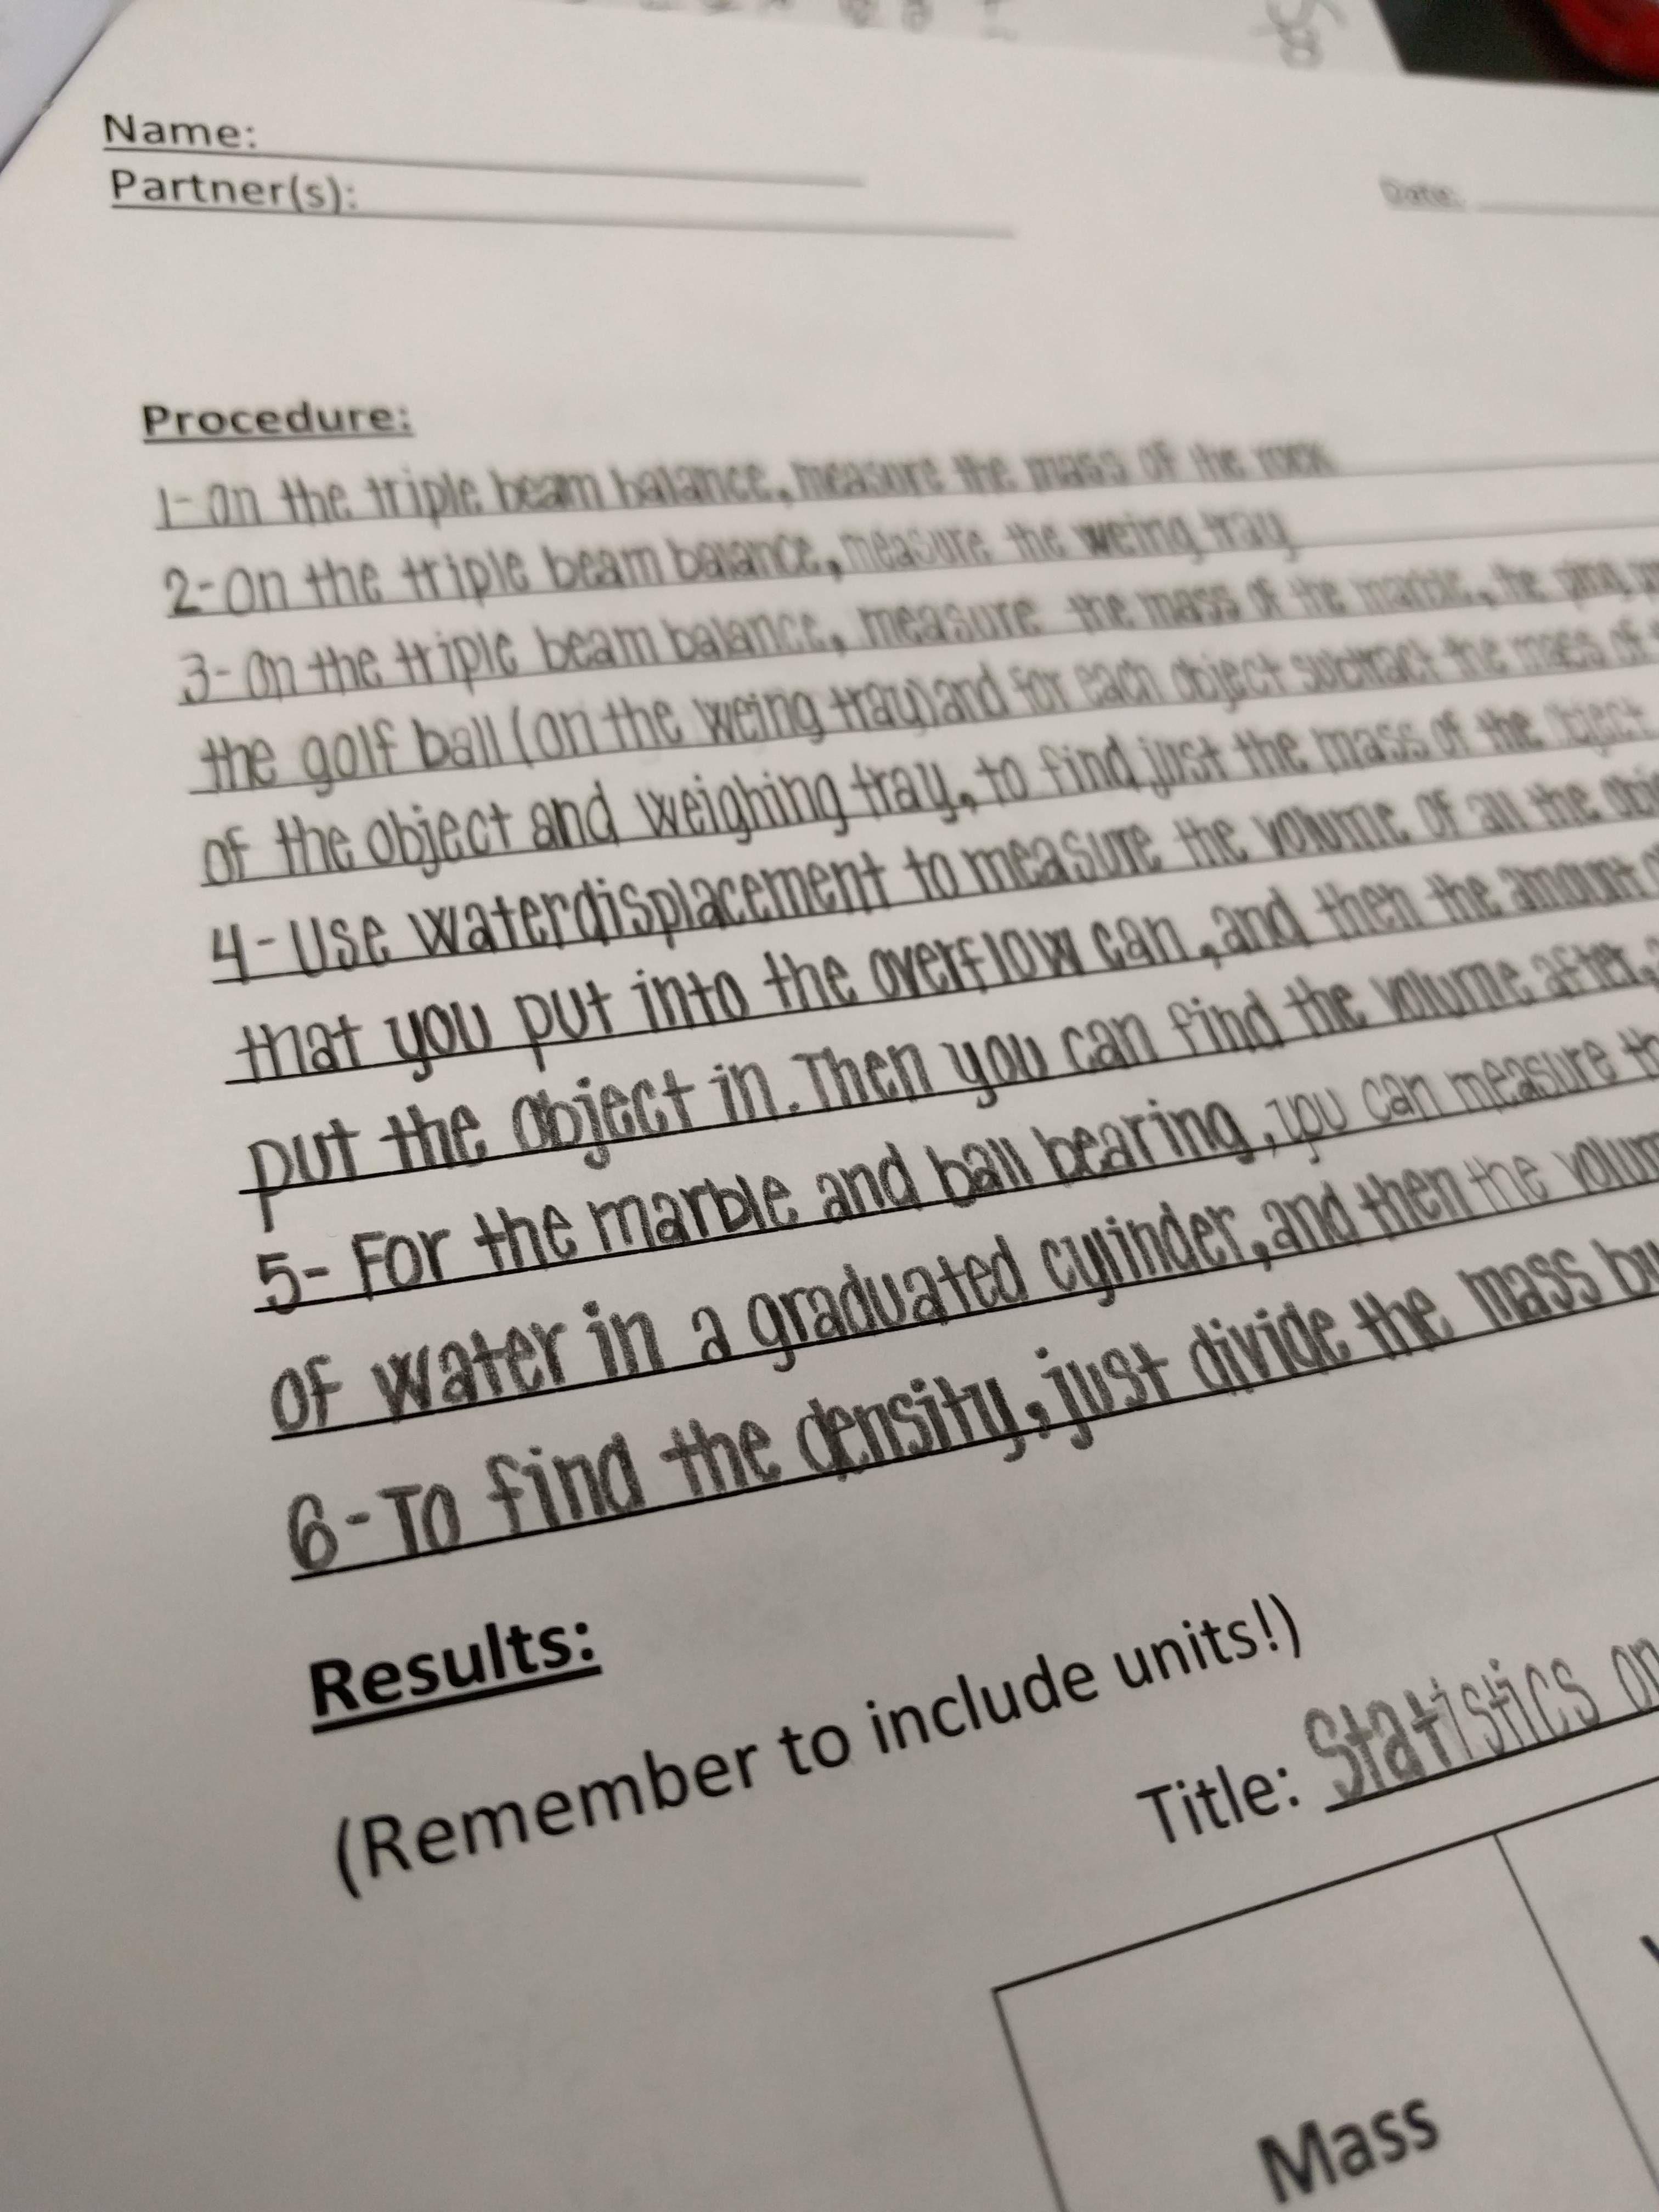 Grade 7 Student S Lab Report